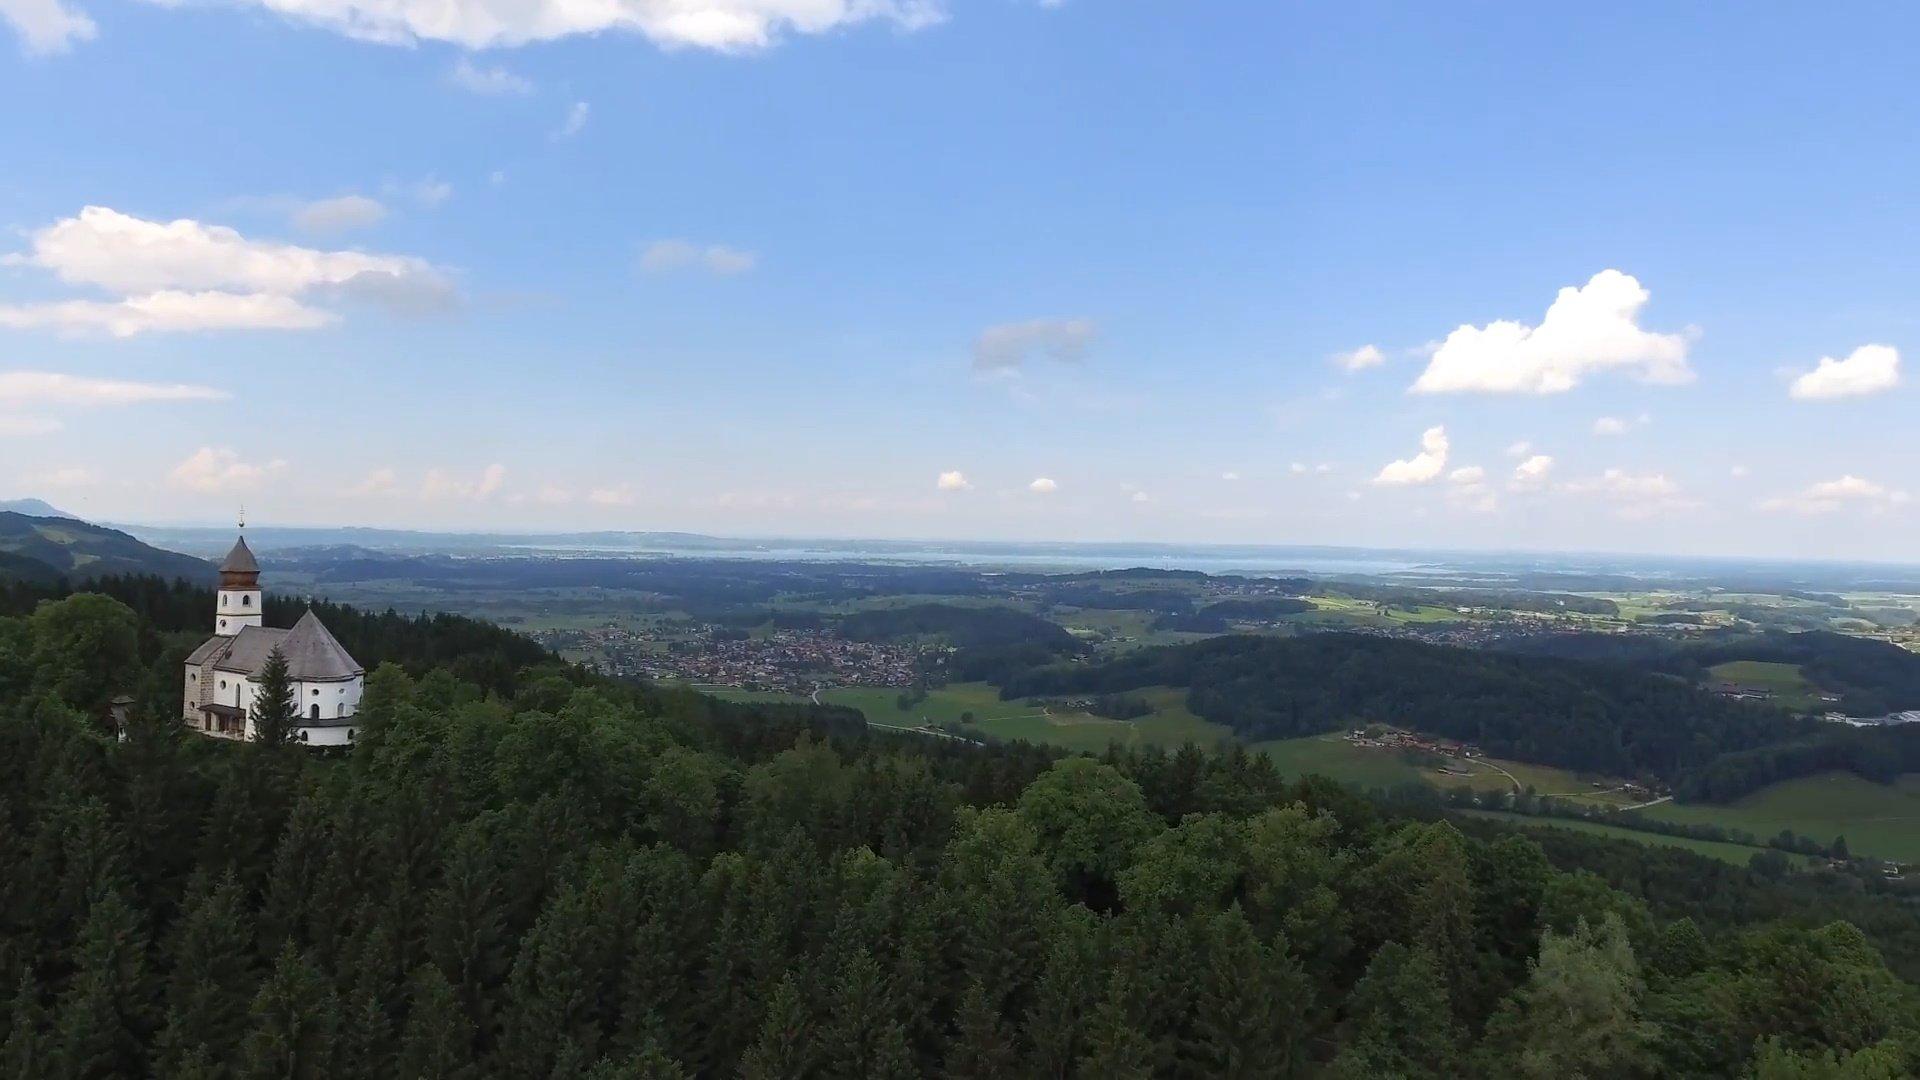 Siegsdorf Chiemsee-Chiemgau Drohnenaufnahme